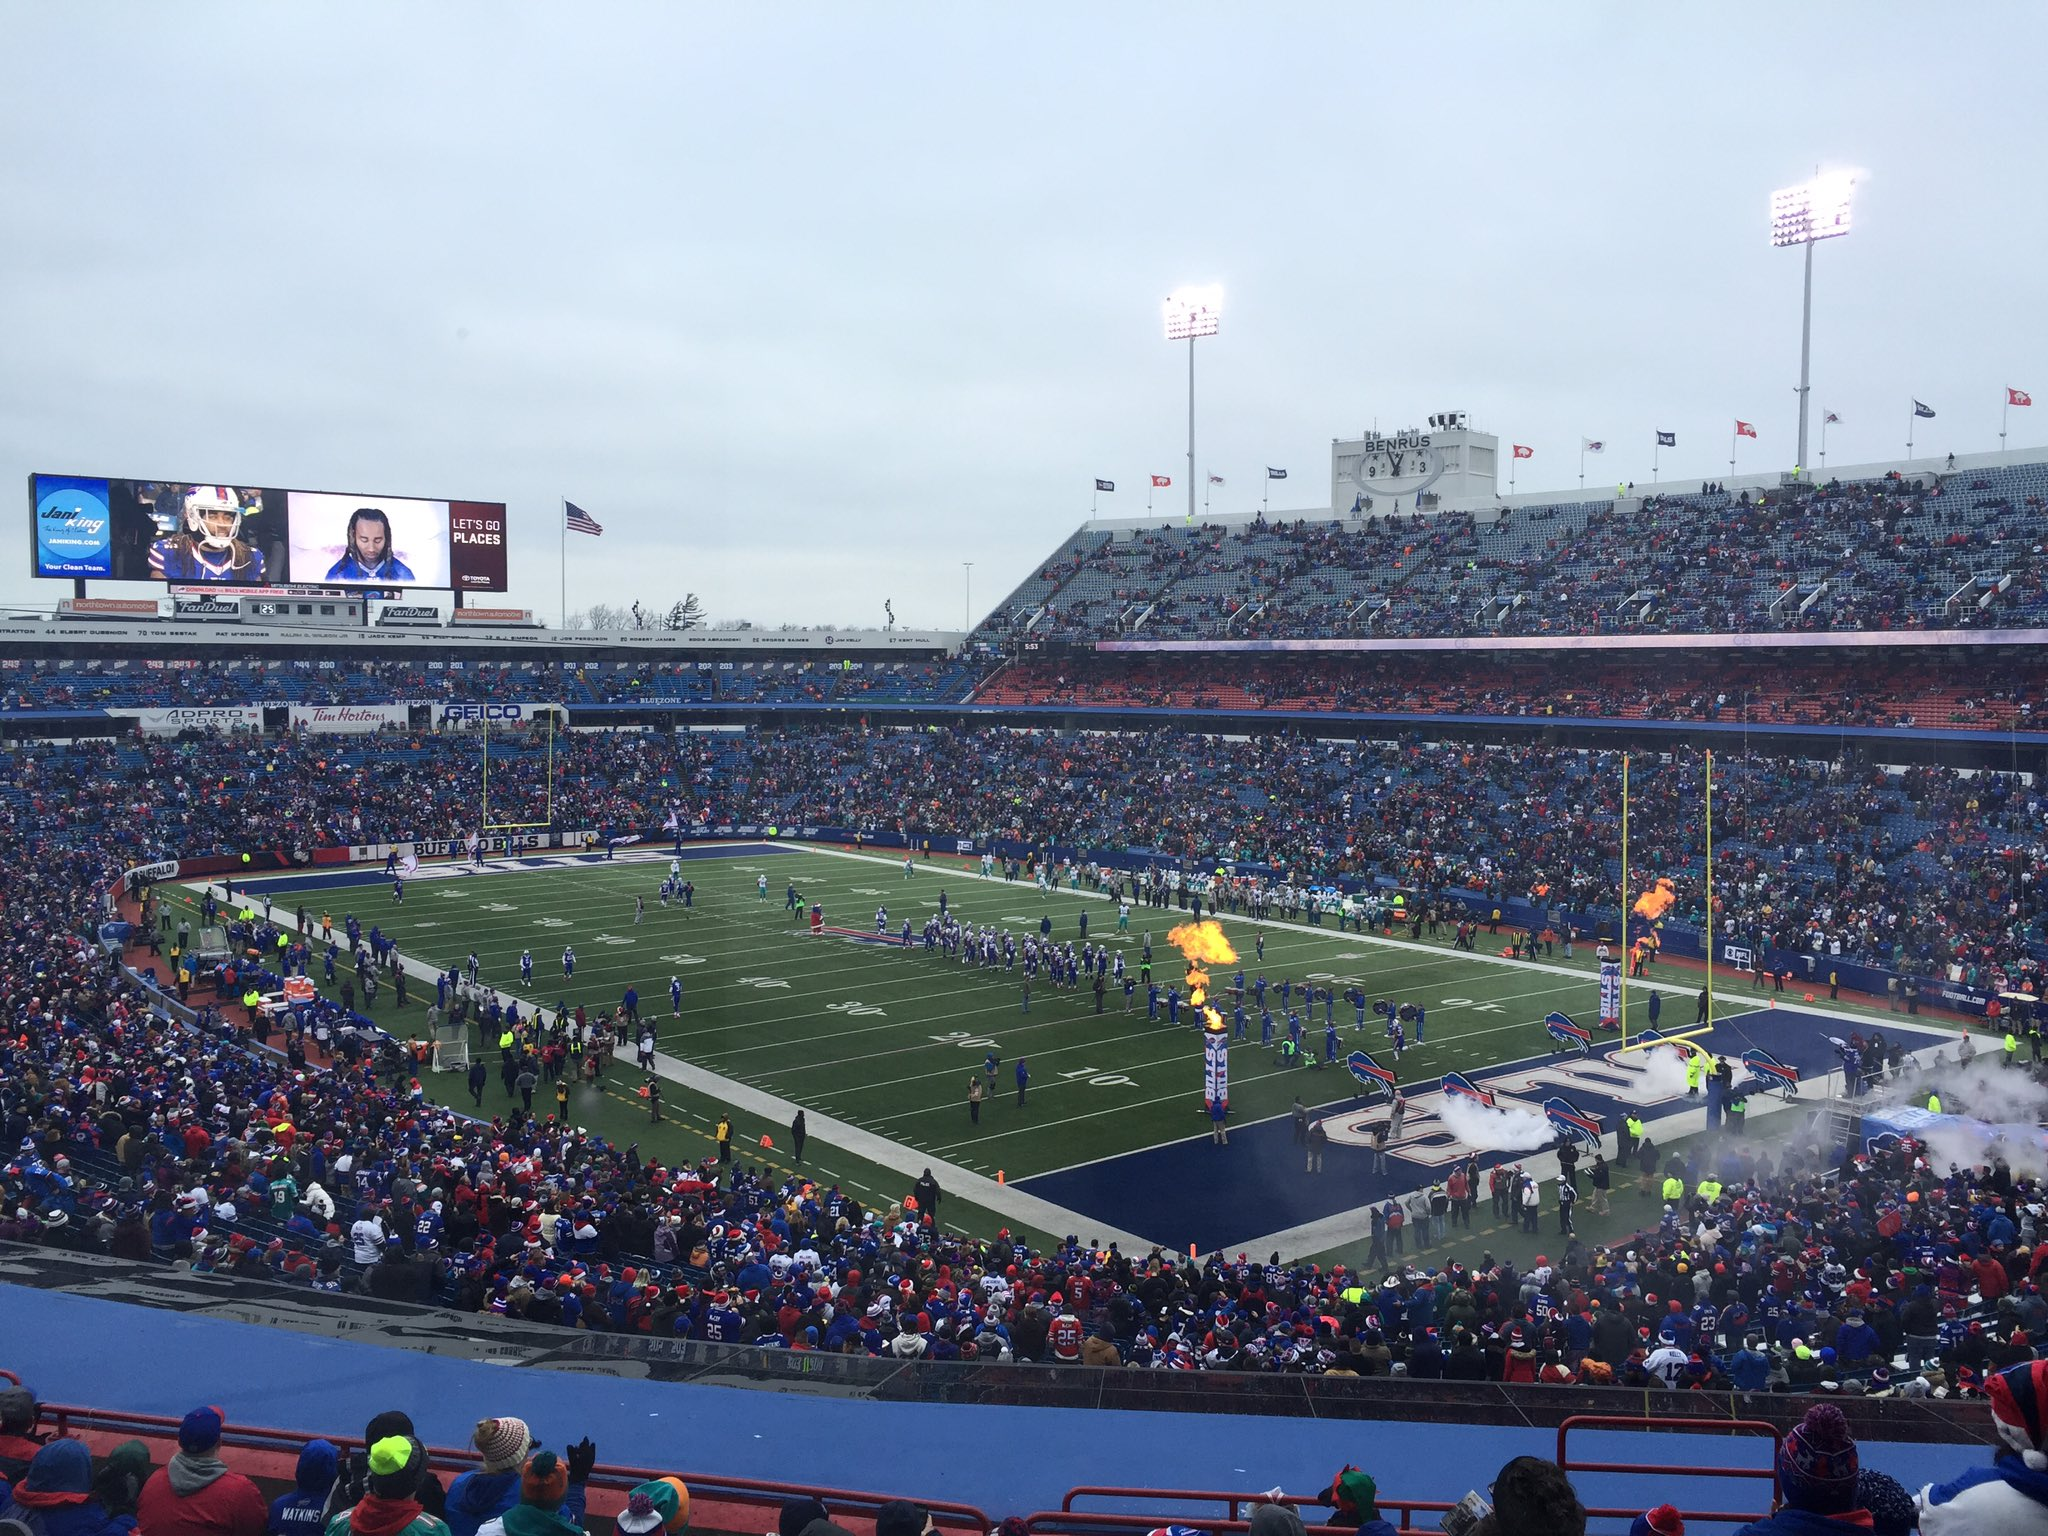 Pregame ceremonies at New Era Field. (Keith McShea/Buffalo News)